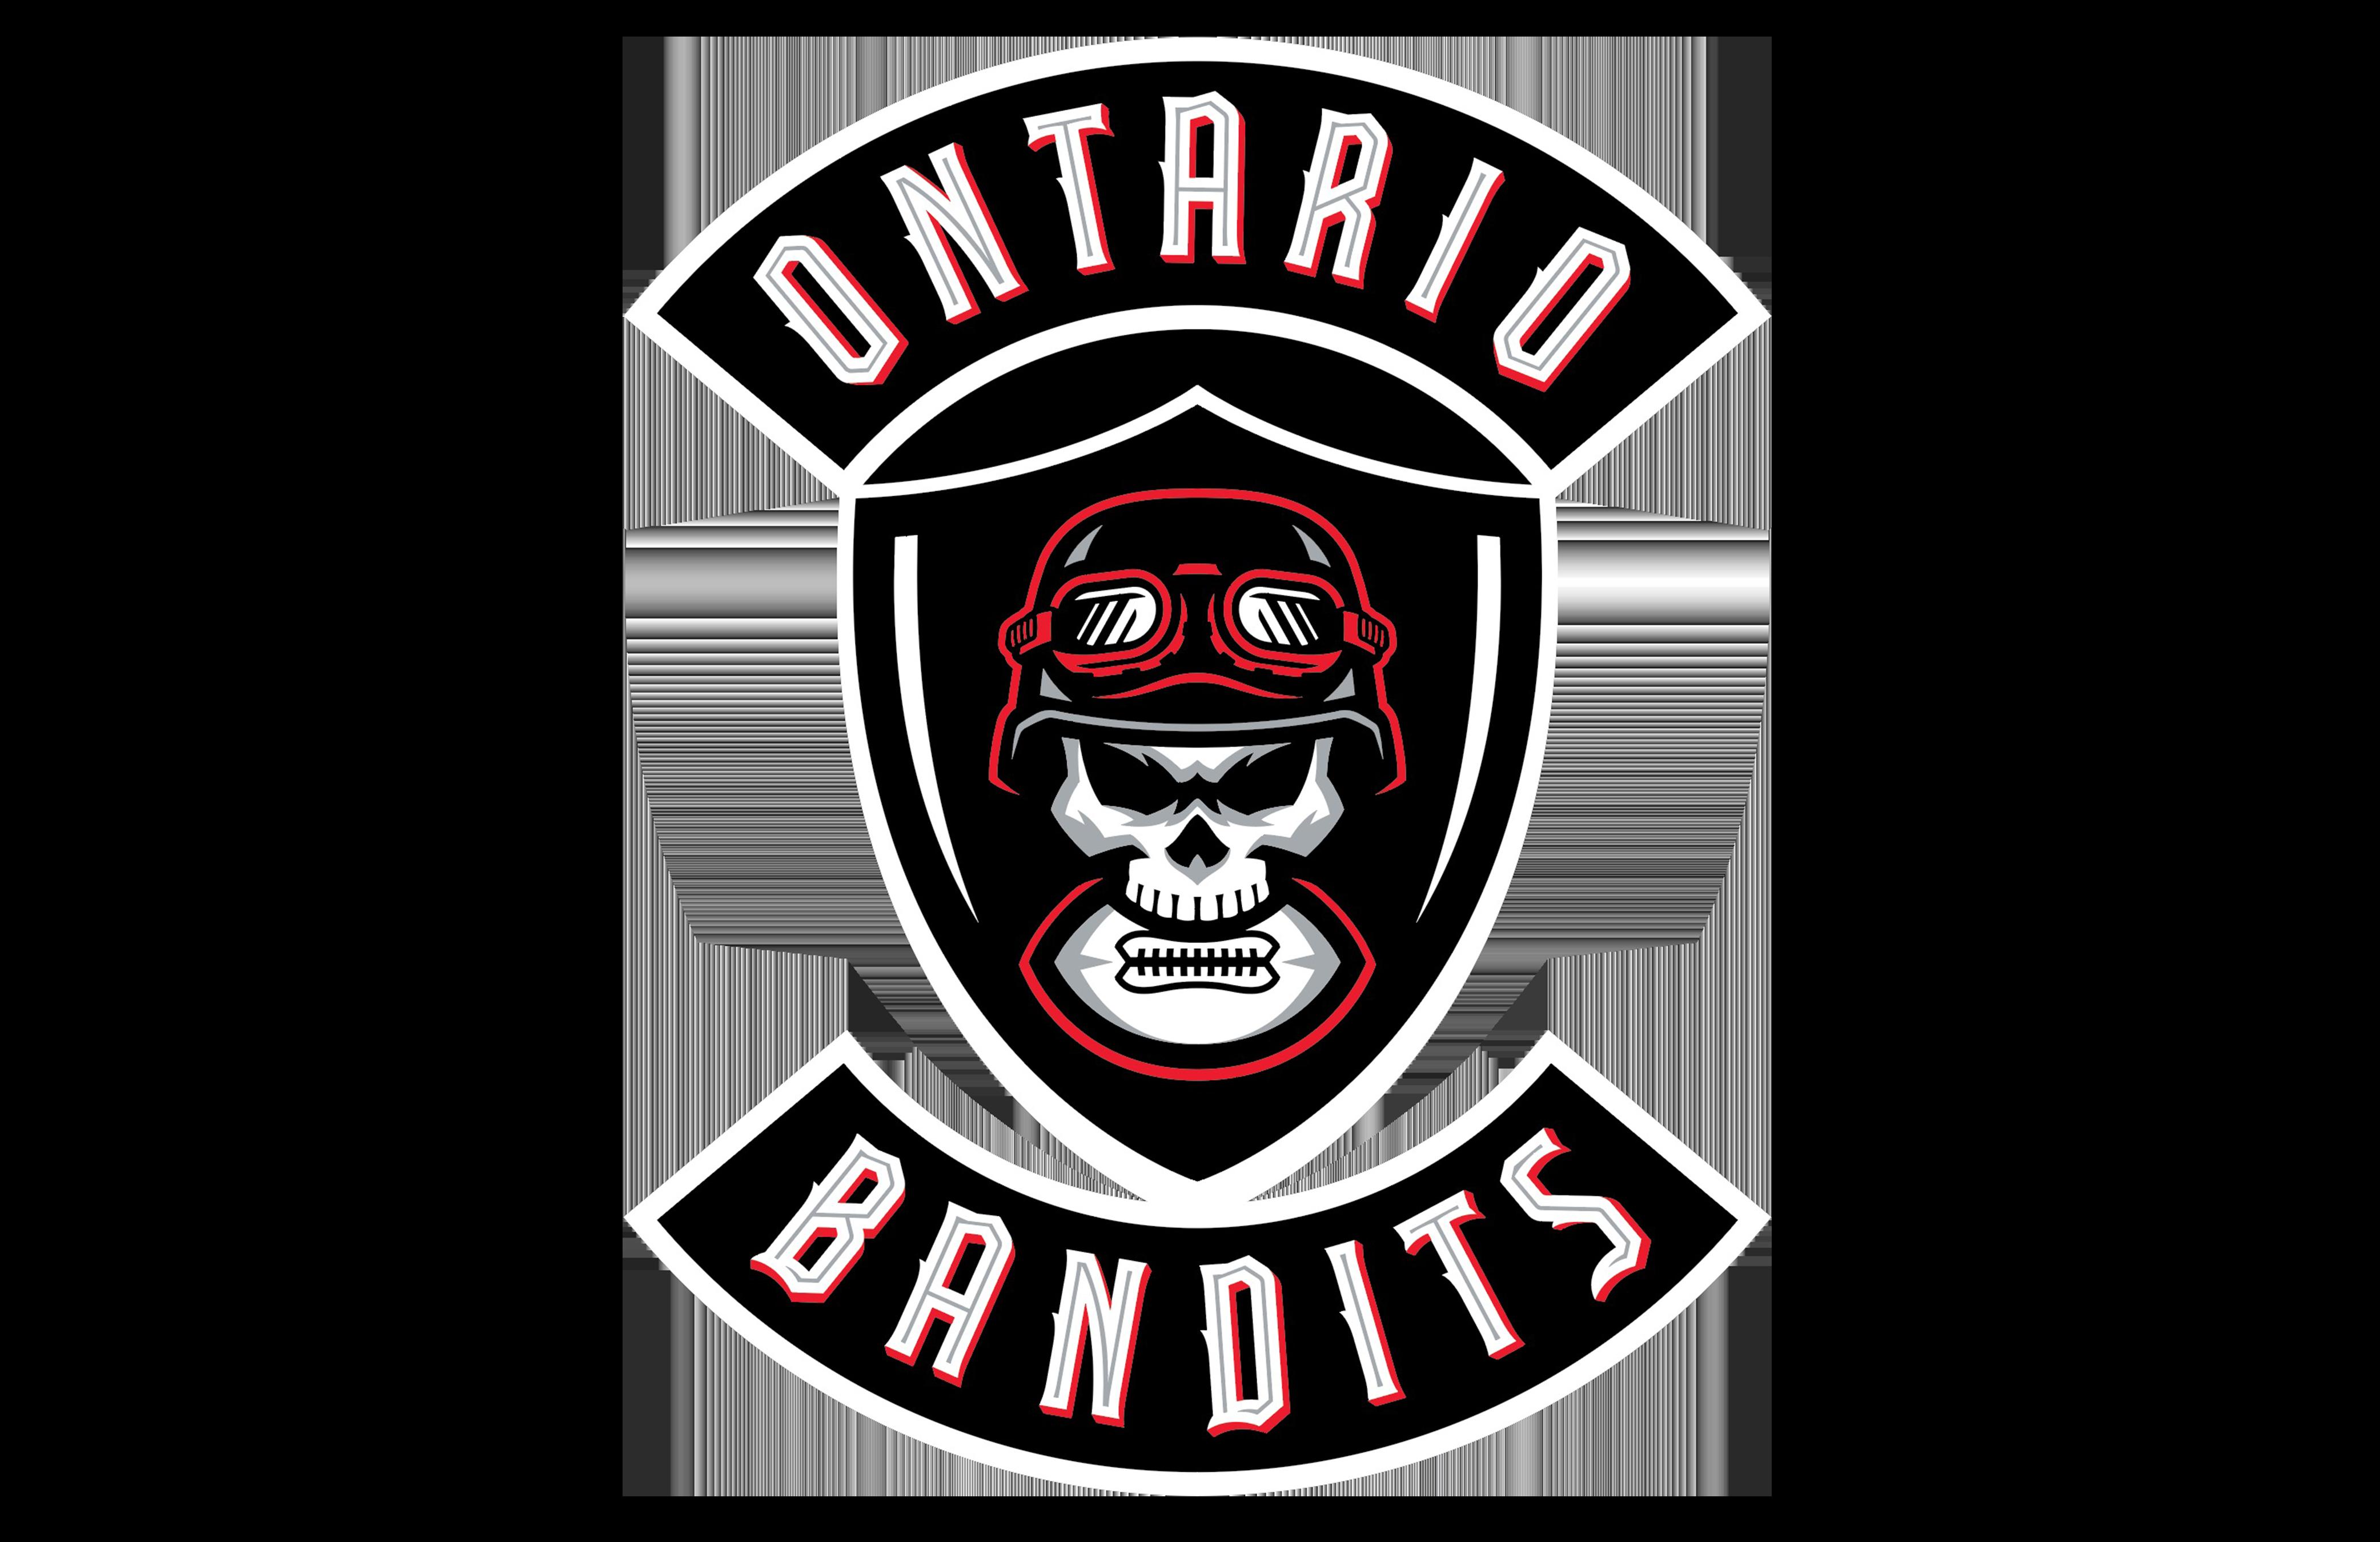 Ontario Bandits